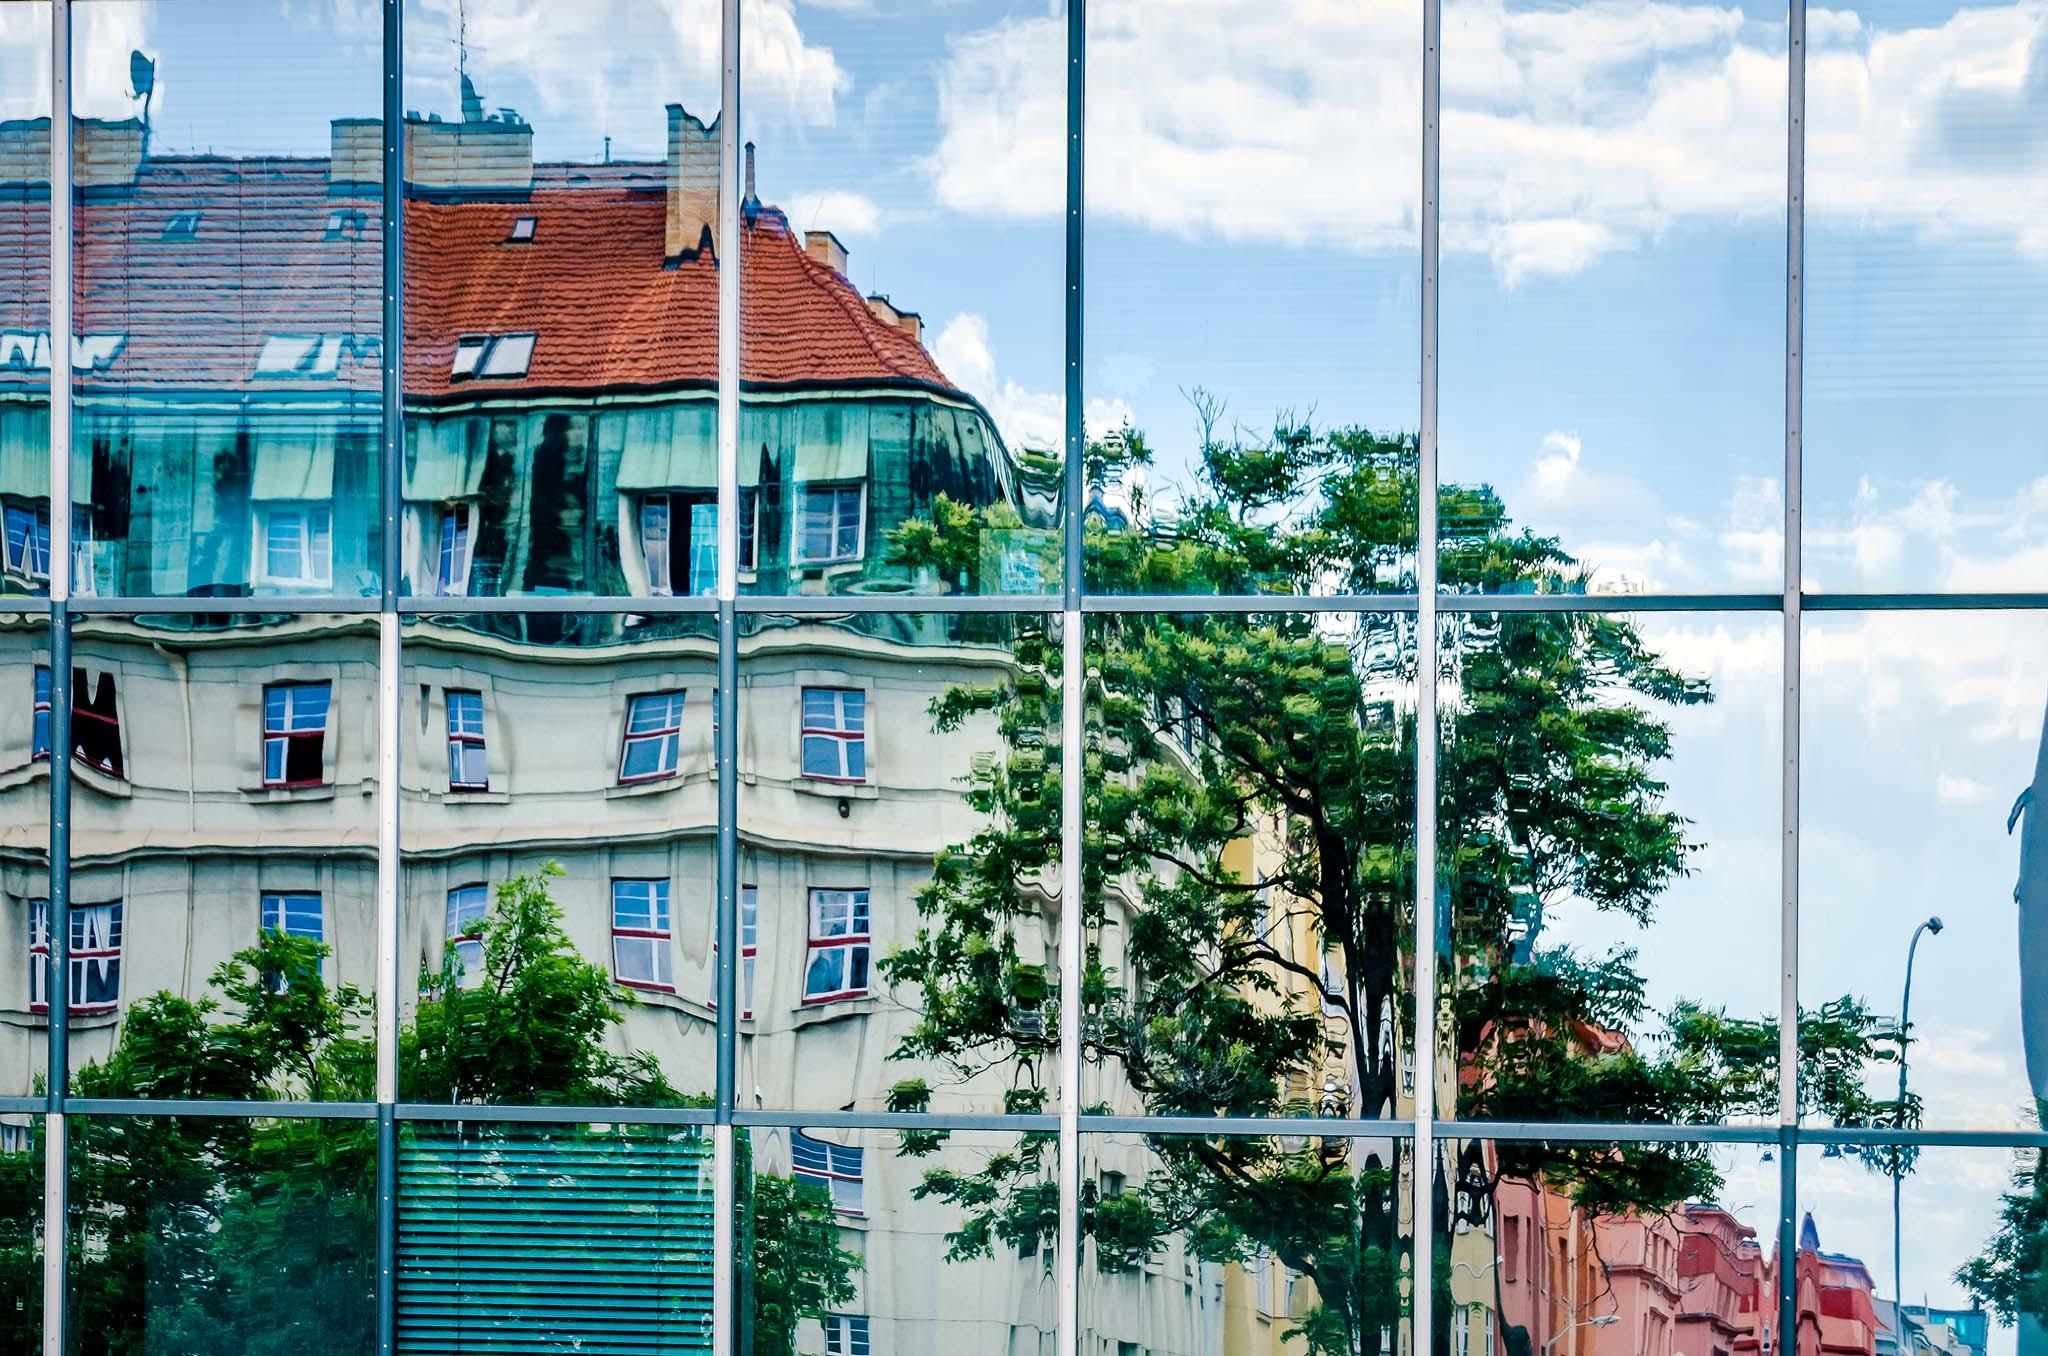 Holesovice in Prague